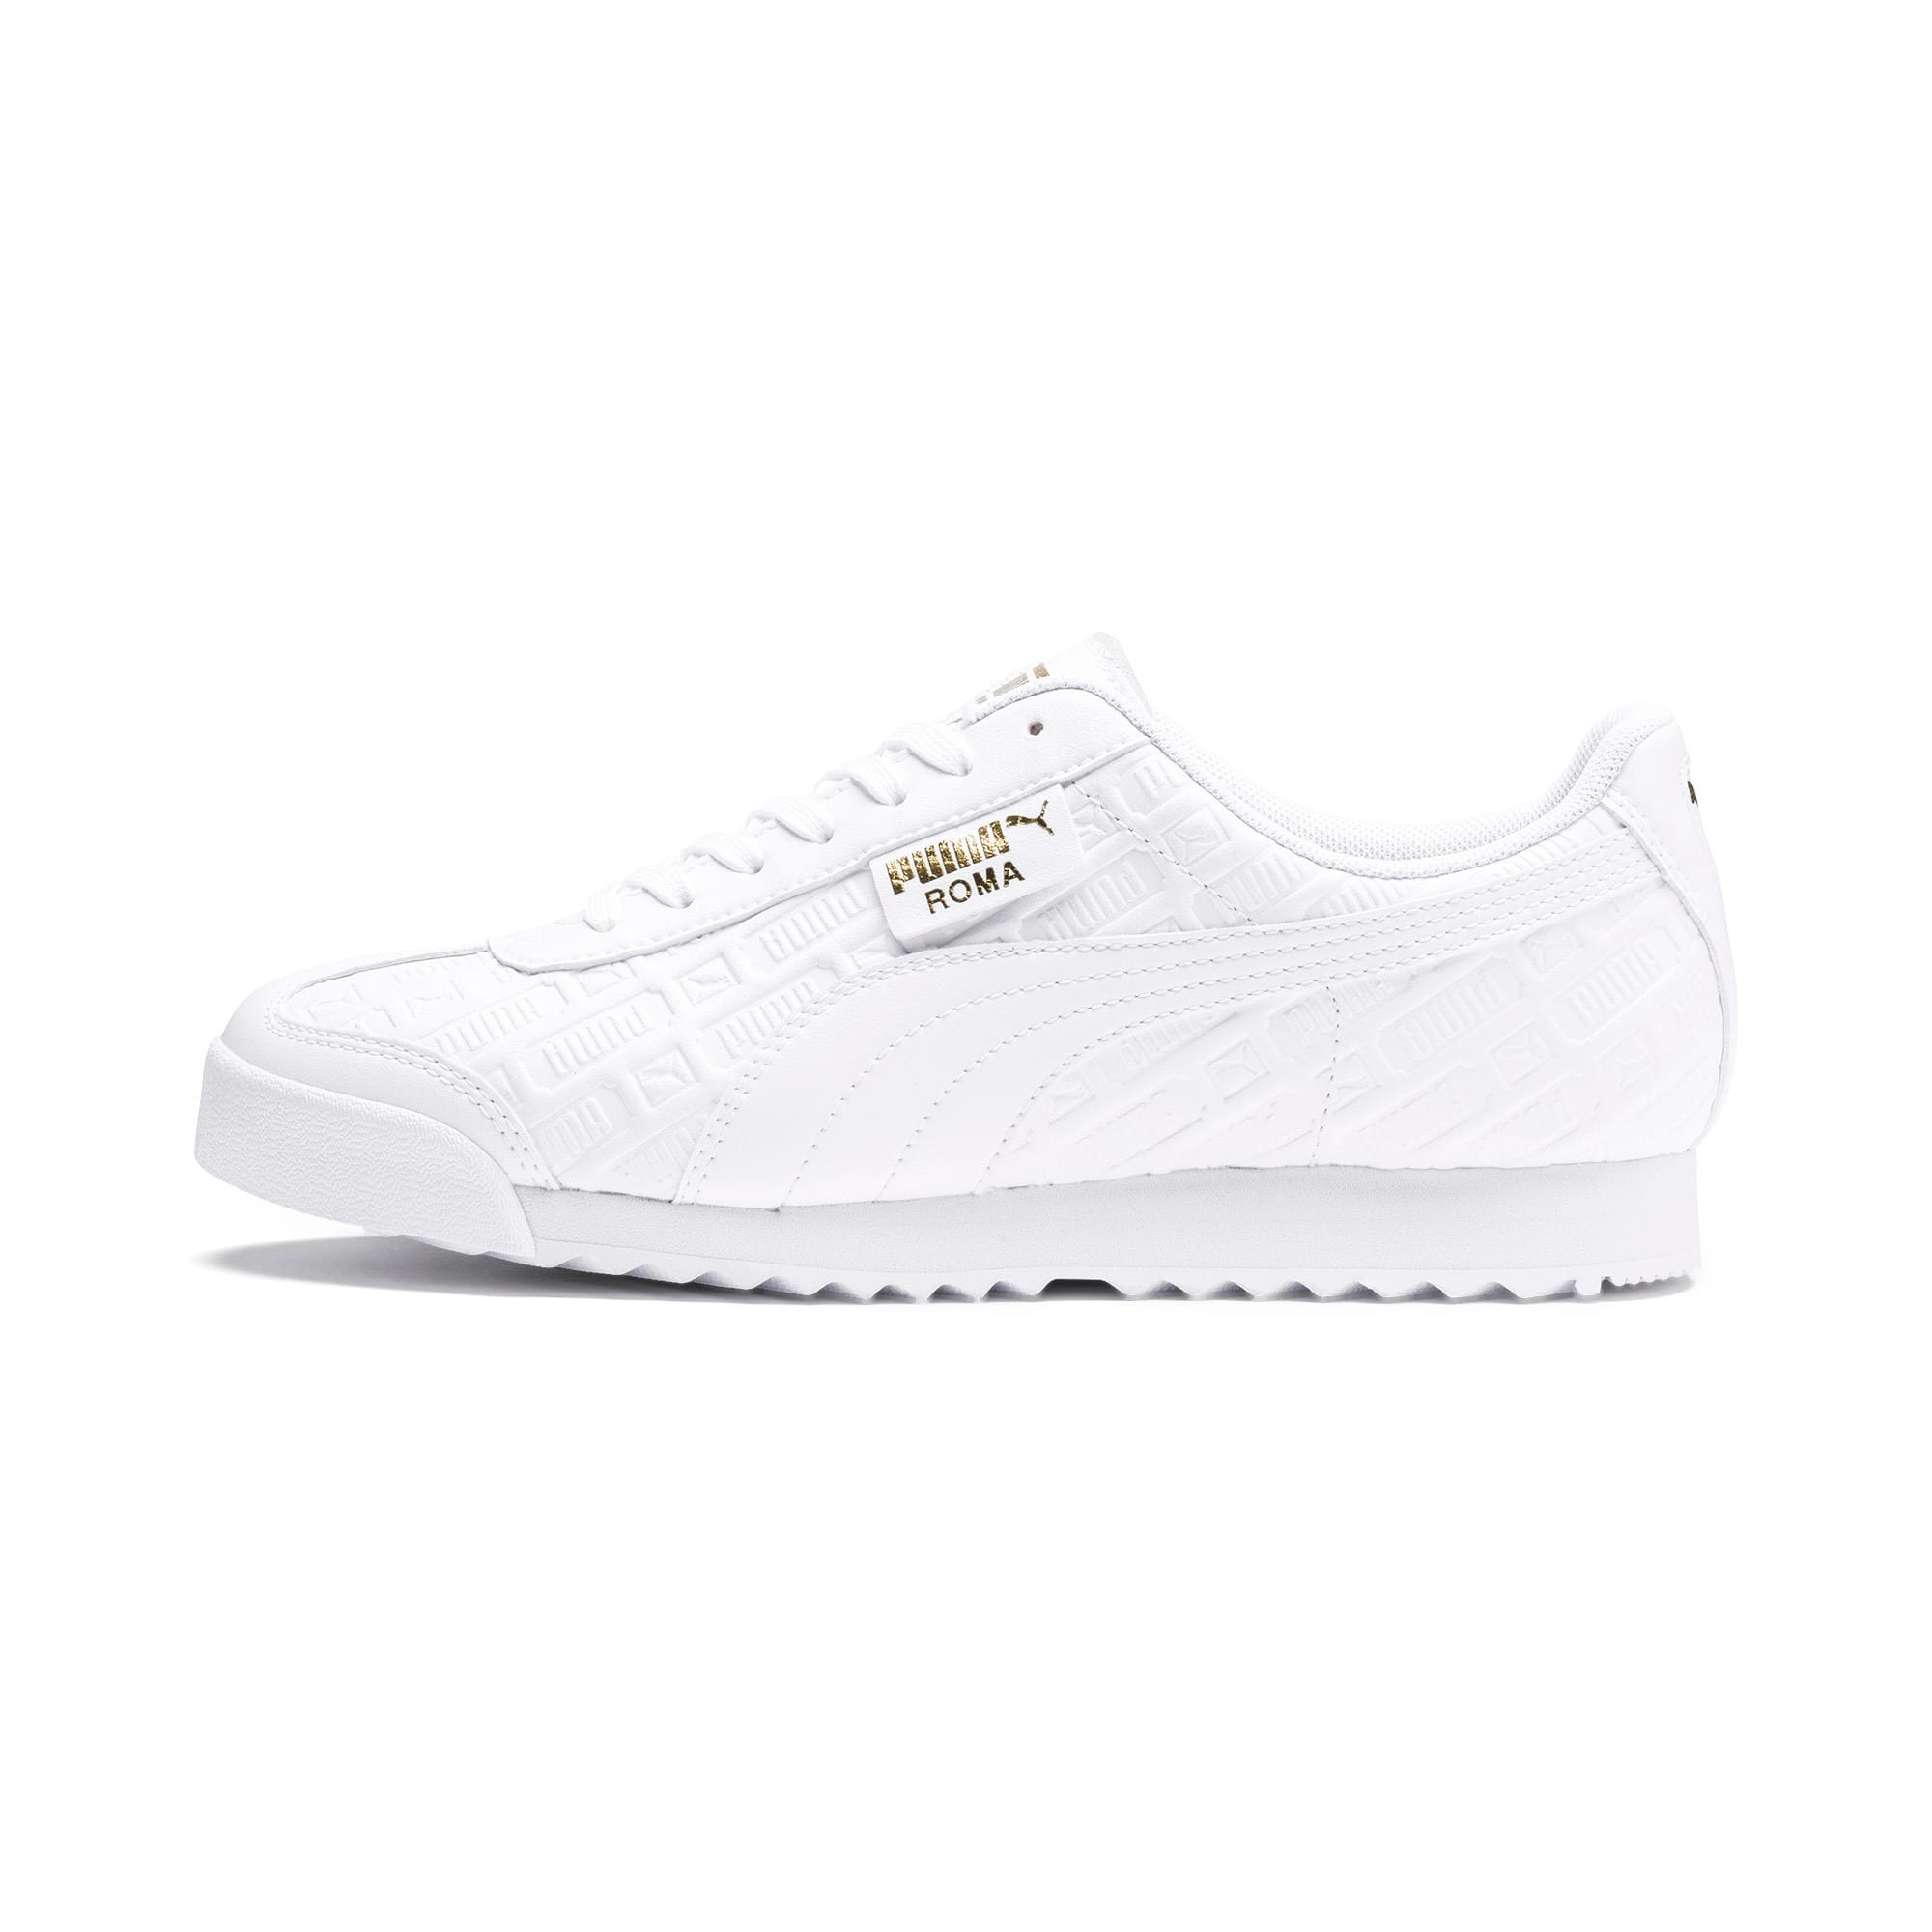 Thumbnail 1 of Roma Reinvent Women's Sneakers, Puma White-Puma Team Gold, medium